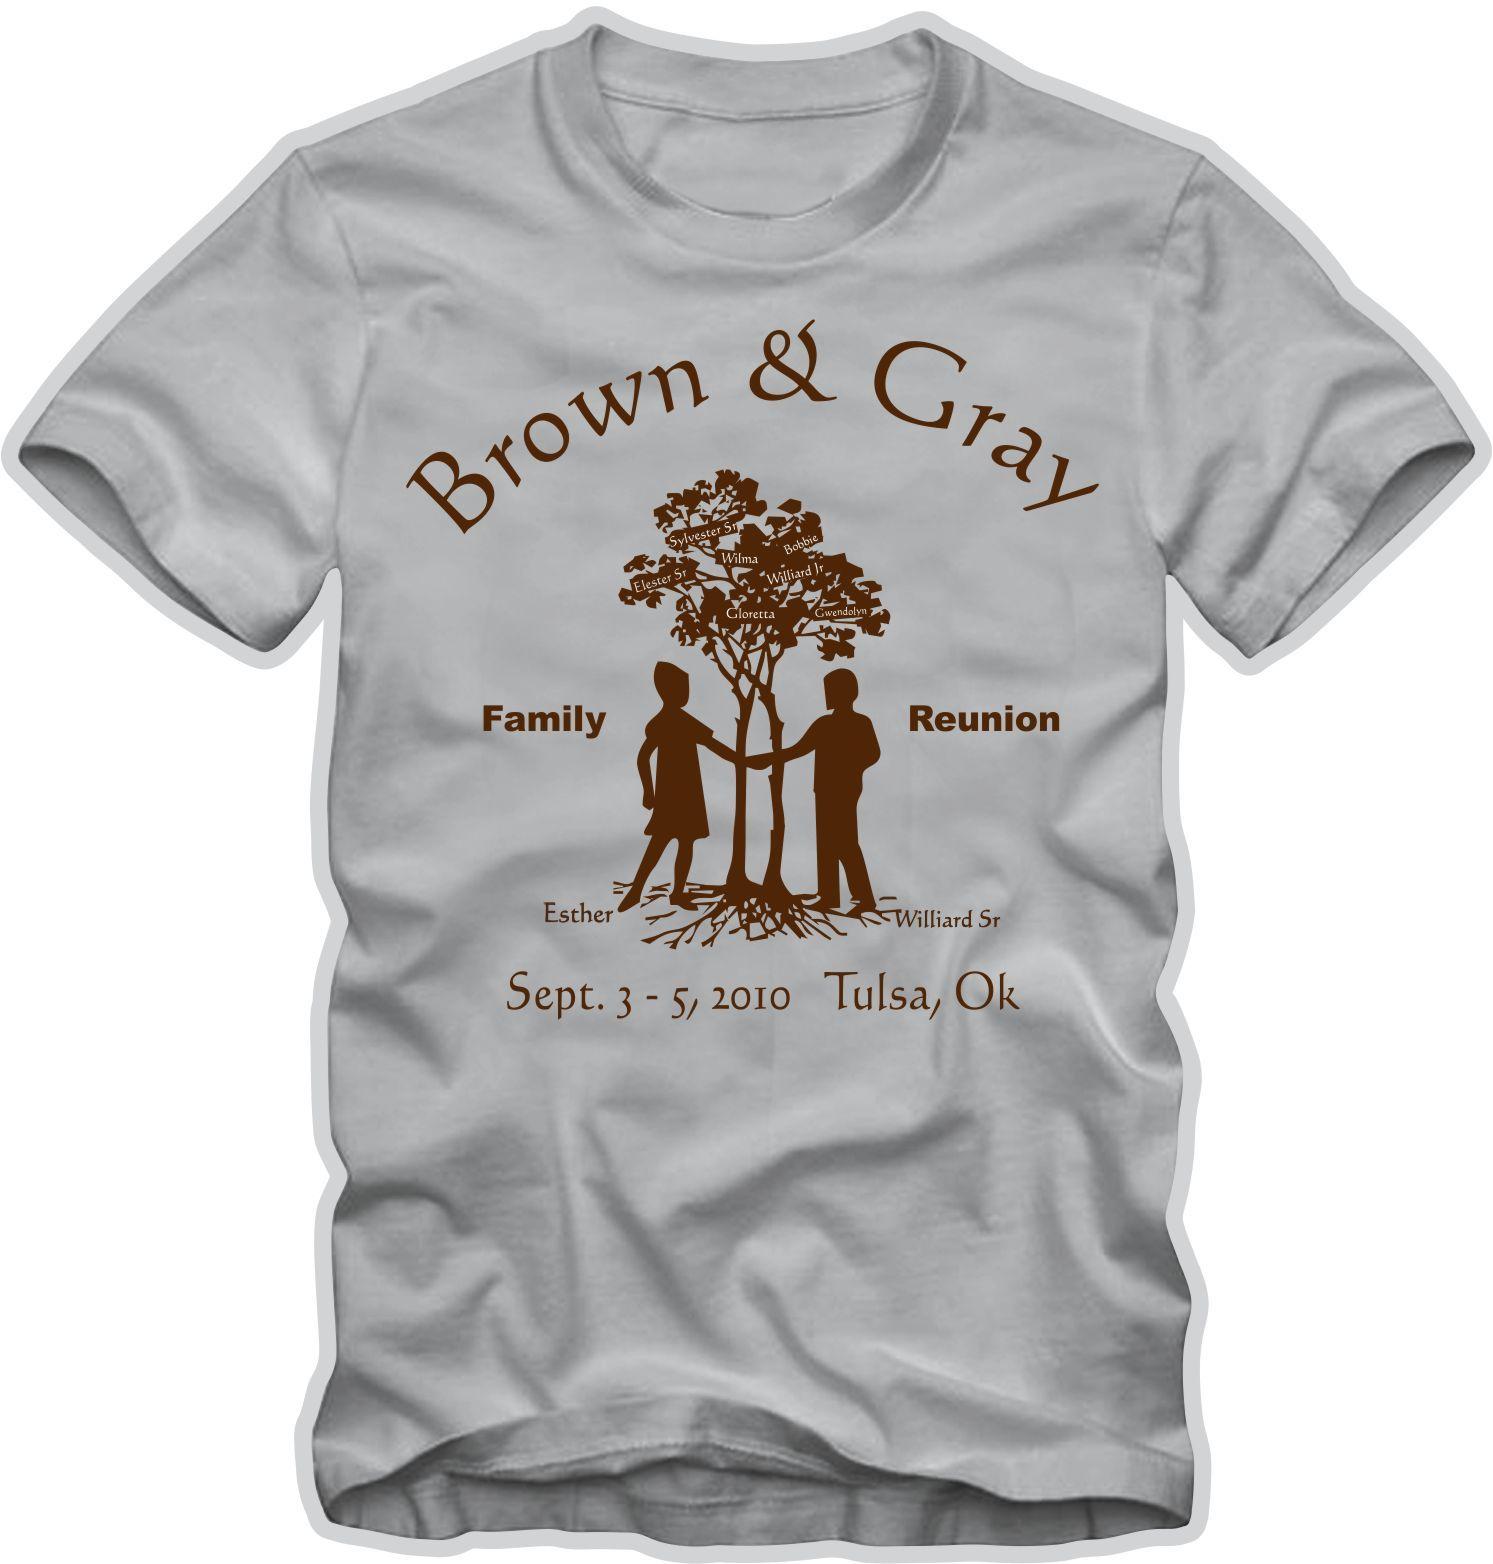 8ec13b8ce Couple And Tree family reunion t-shirt. | T-Shirts - Family Reunion ...